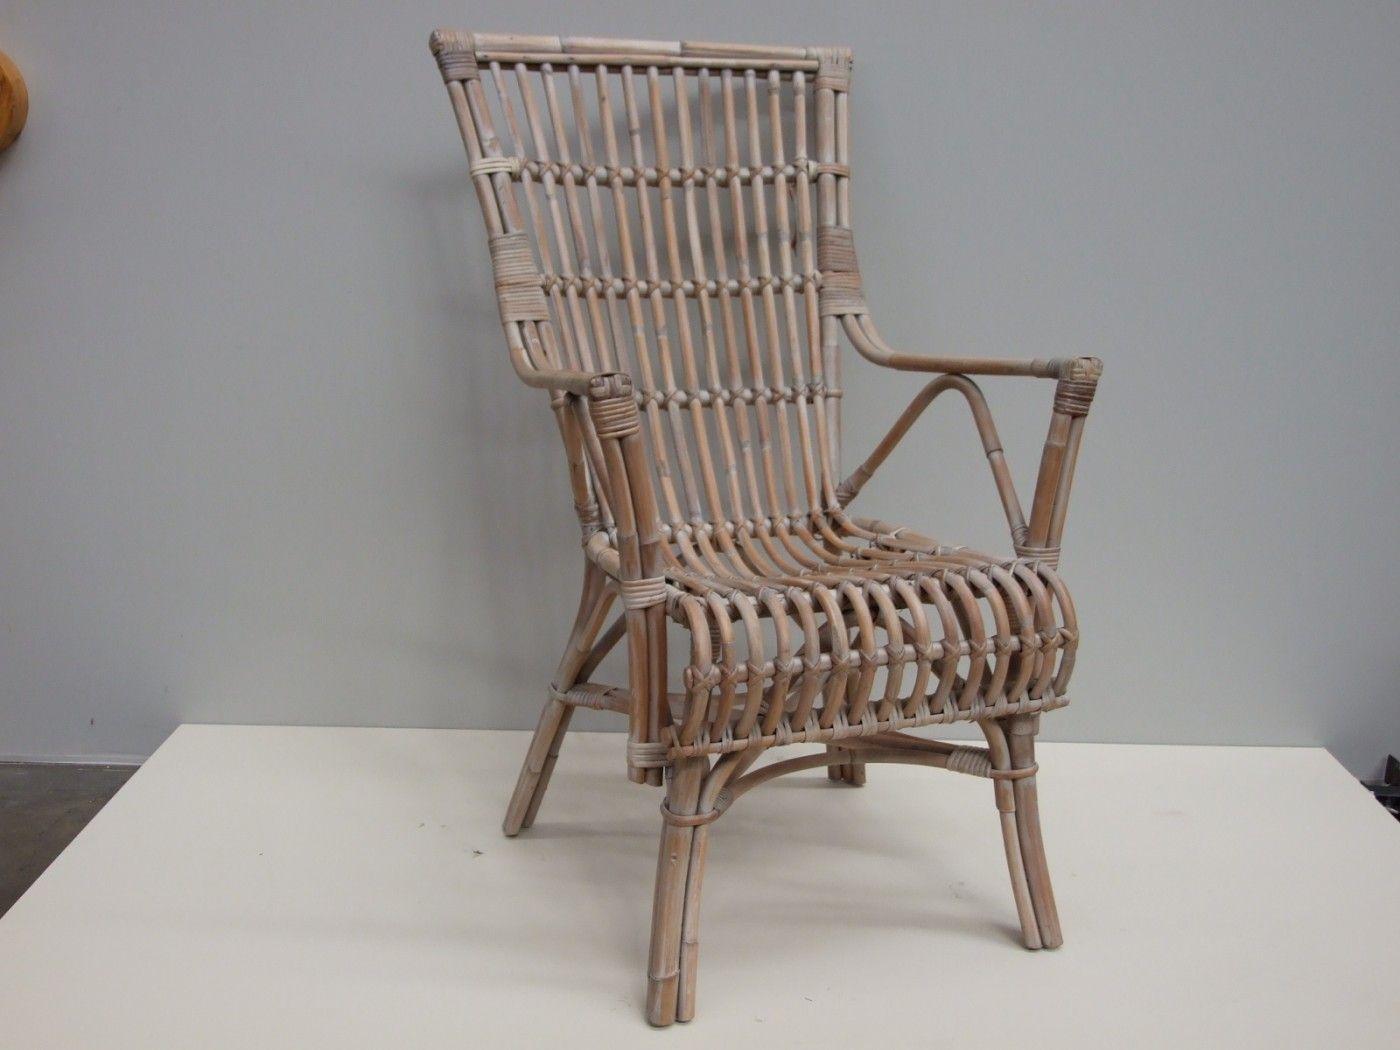 Queenslander Verandah Chair   Outdoor Chairs U0026 Seating | Interiors Online    Furniture Online U0026 Decorating